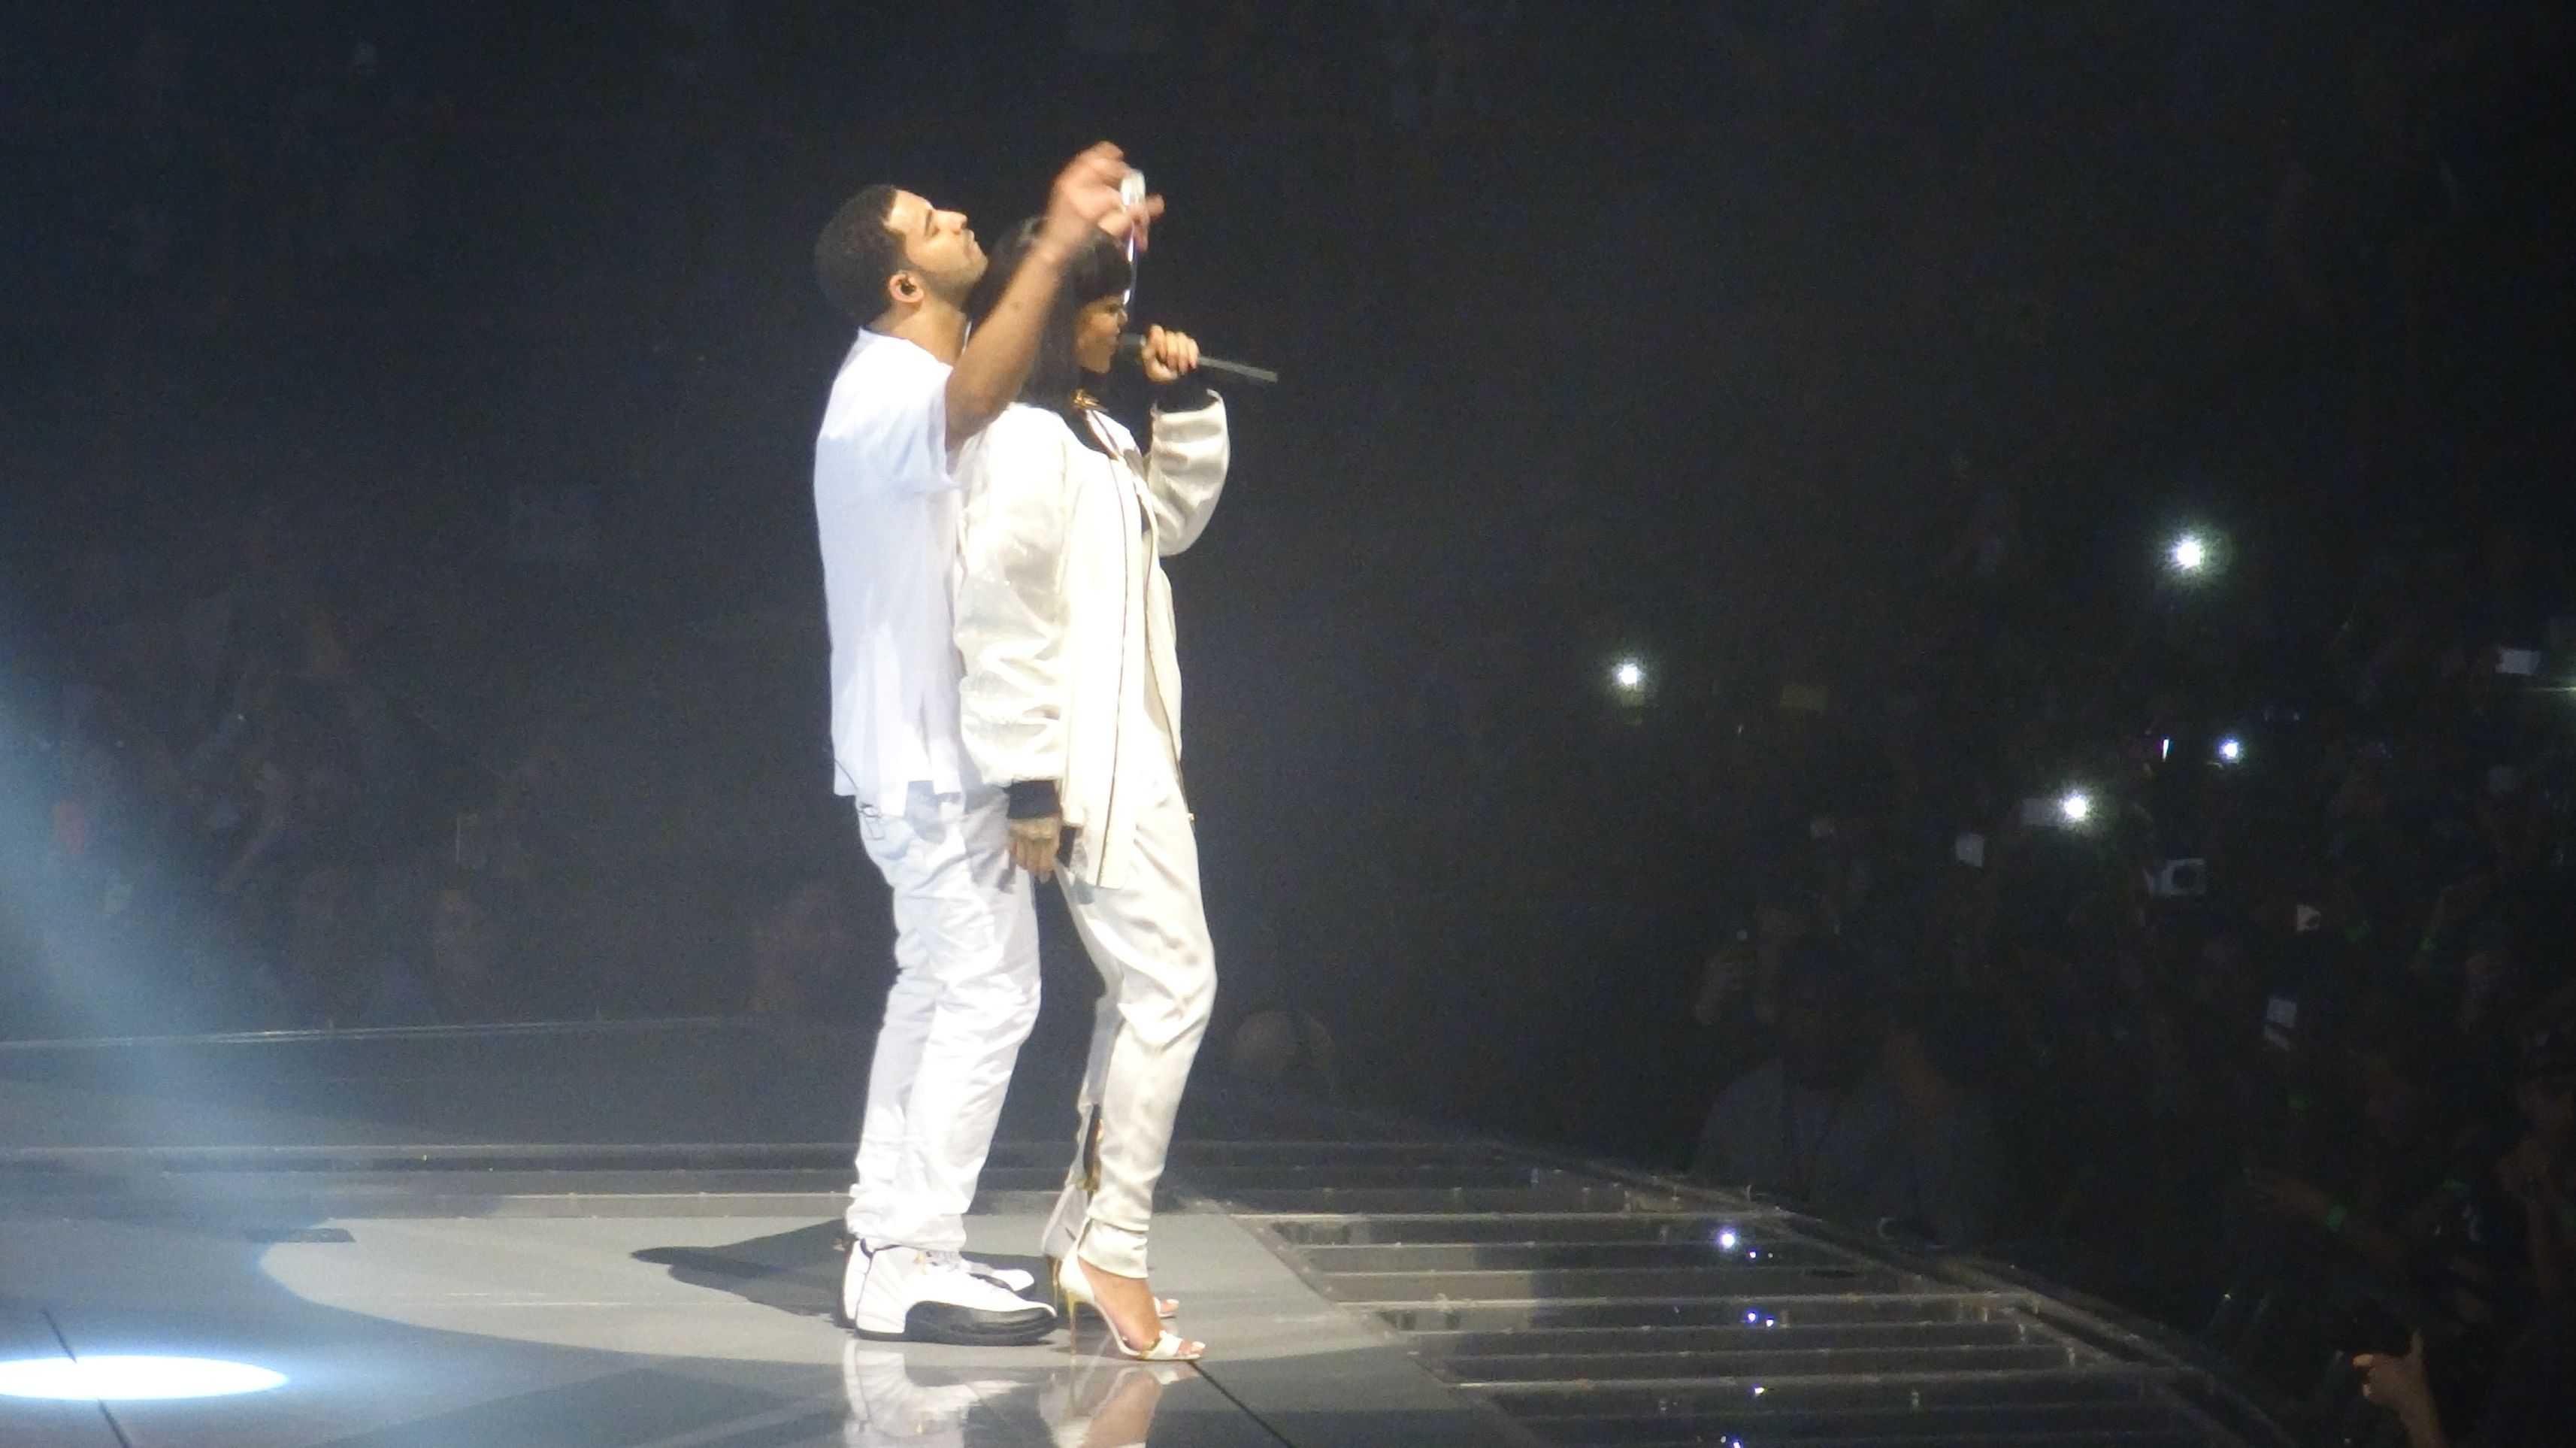 Rave: Drake and Rihanna are